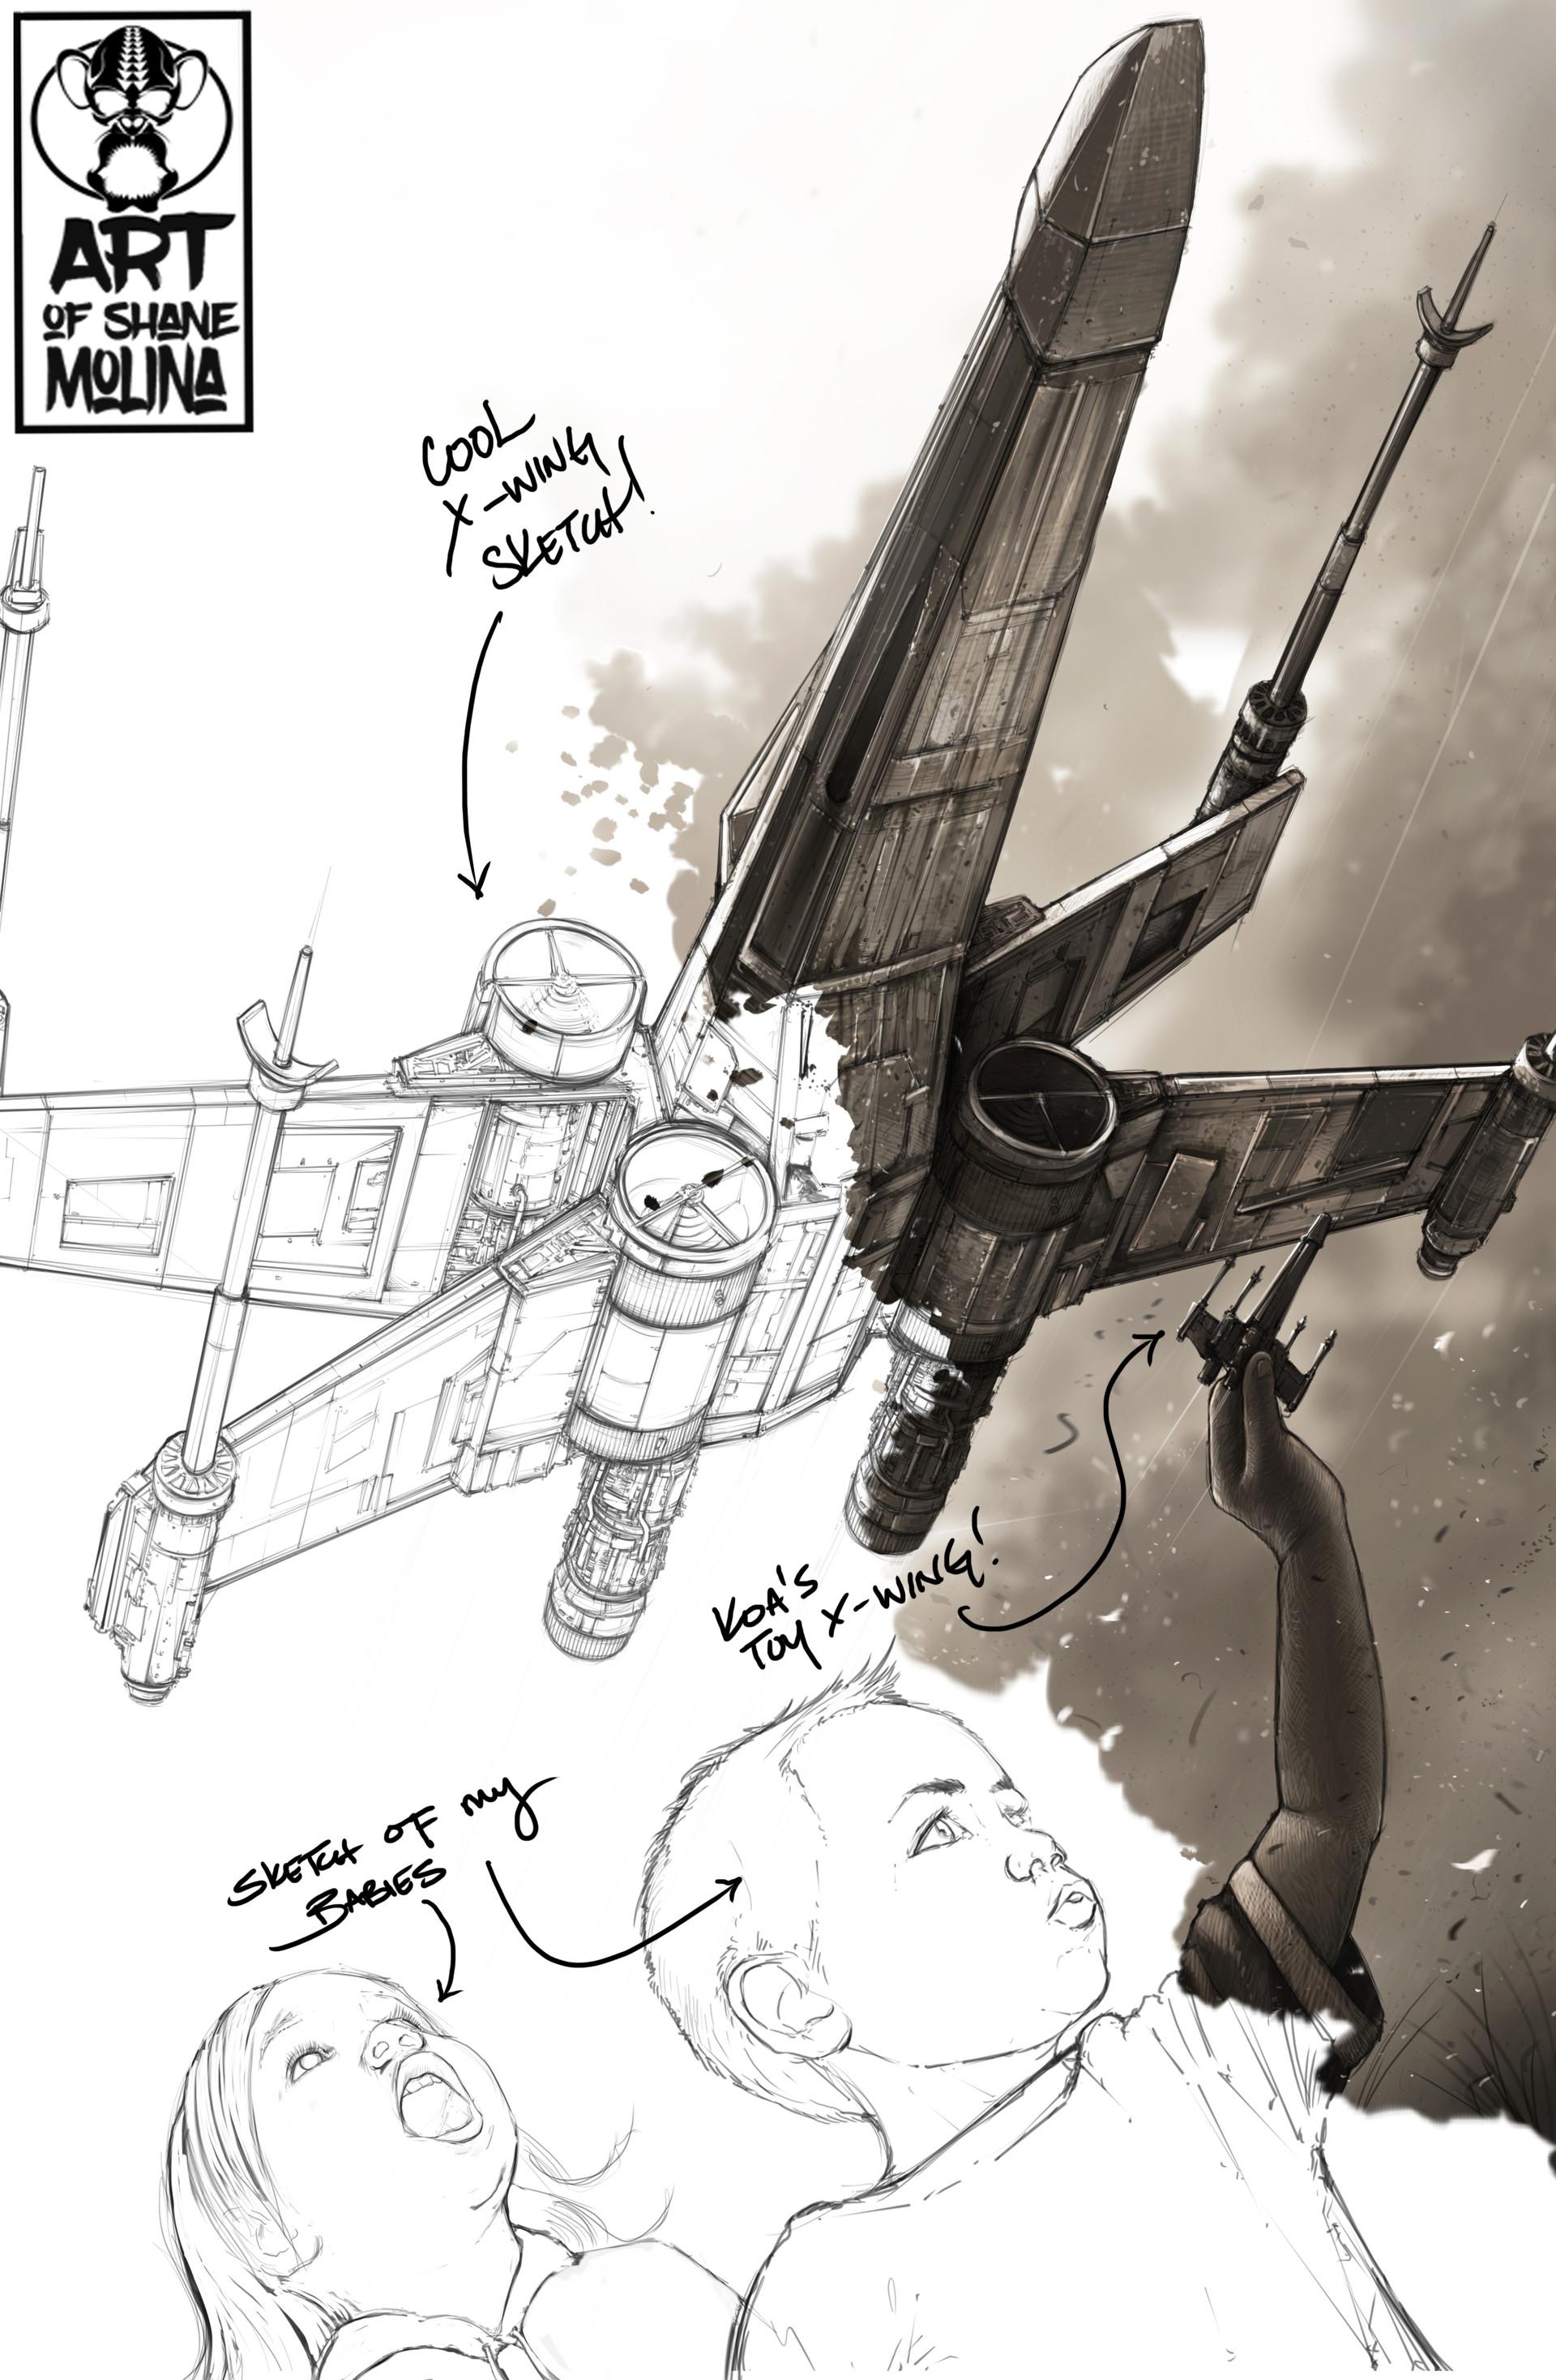 Shane molina xwing keeds sketch